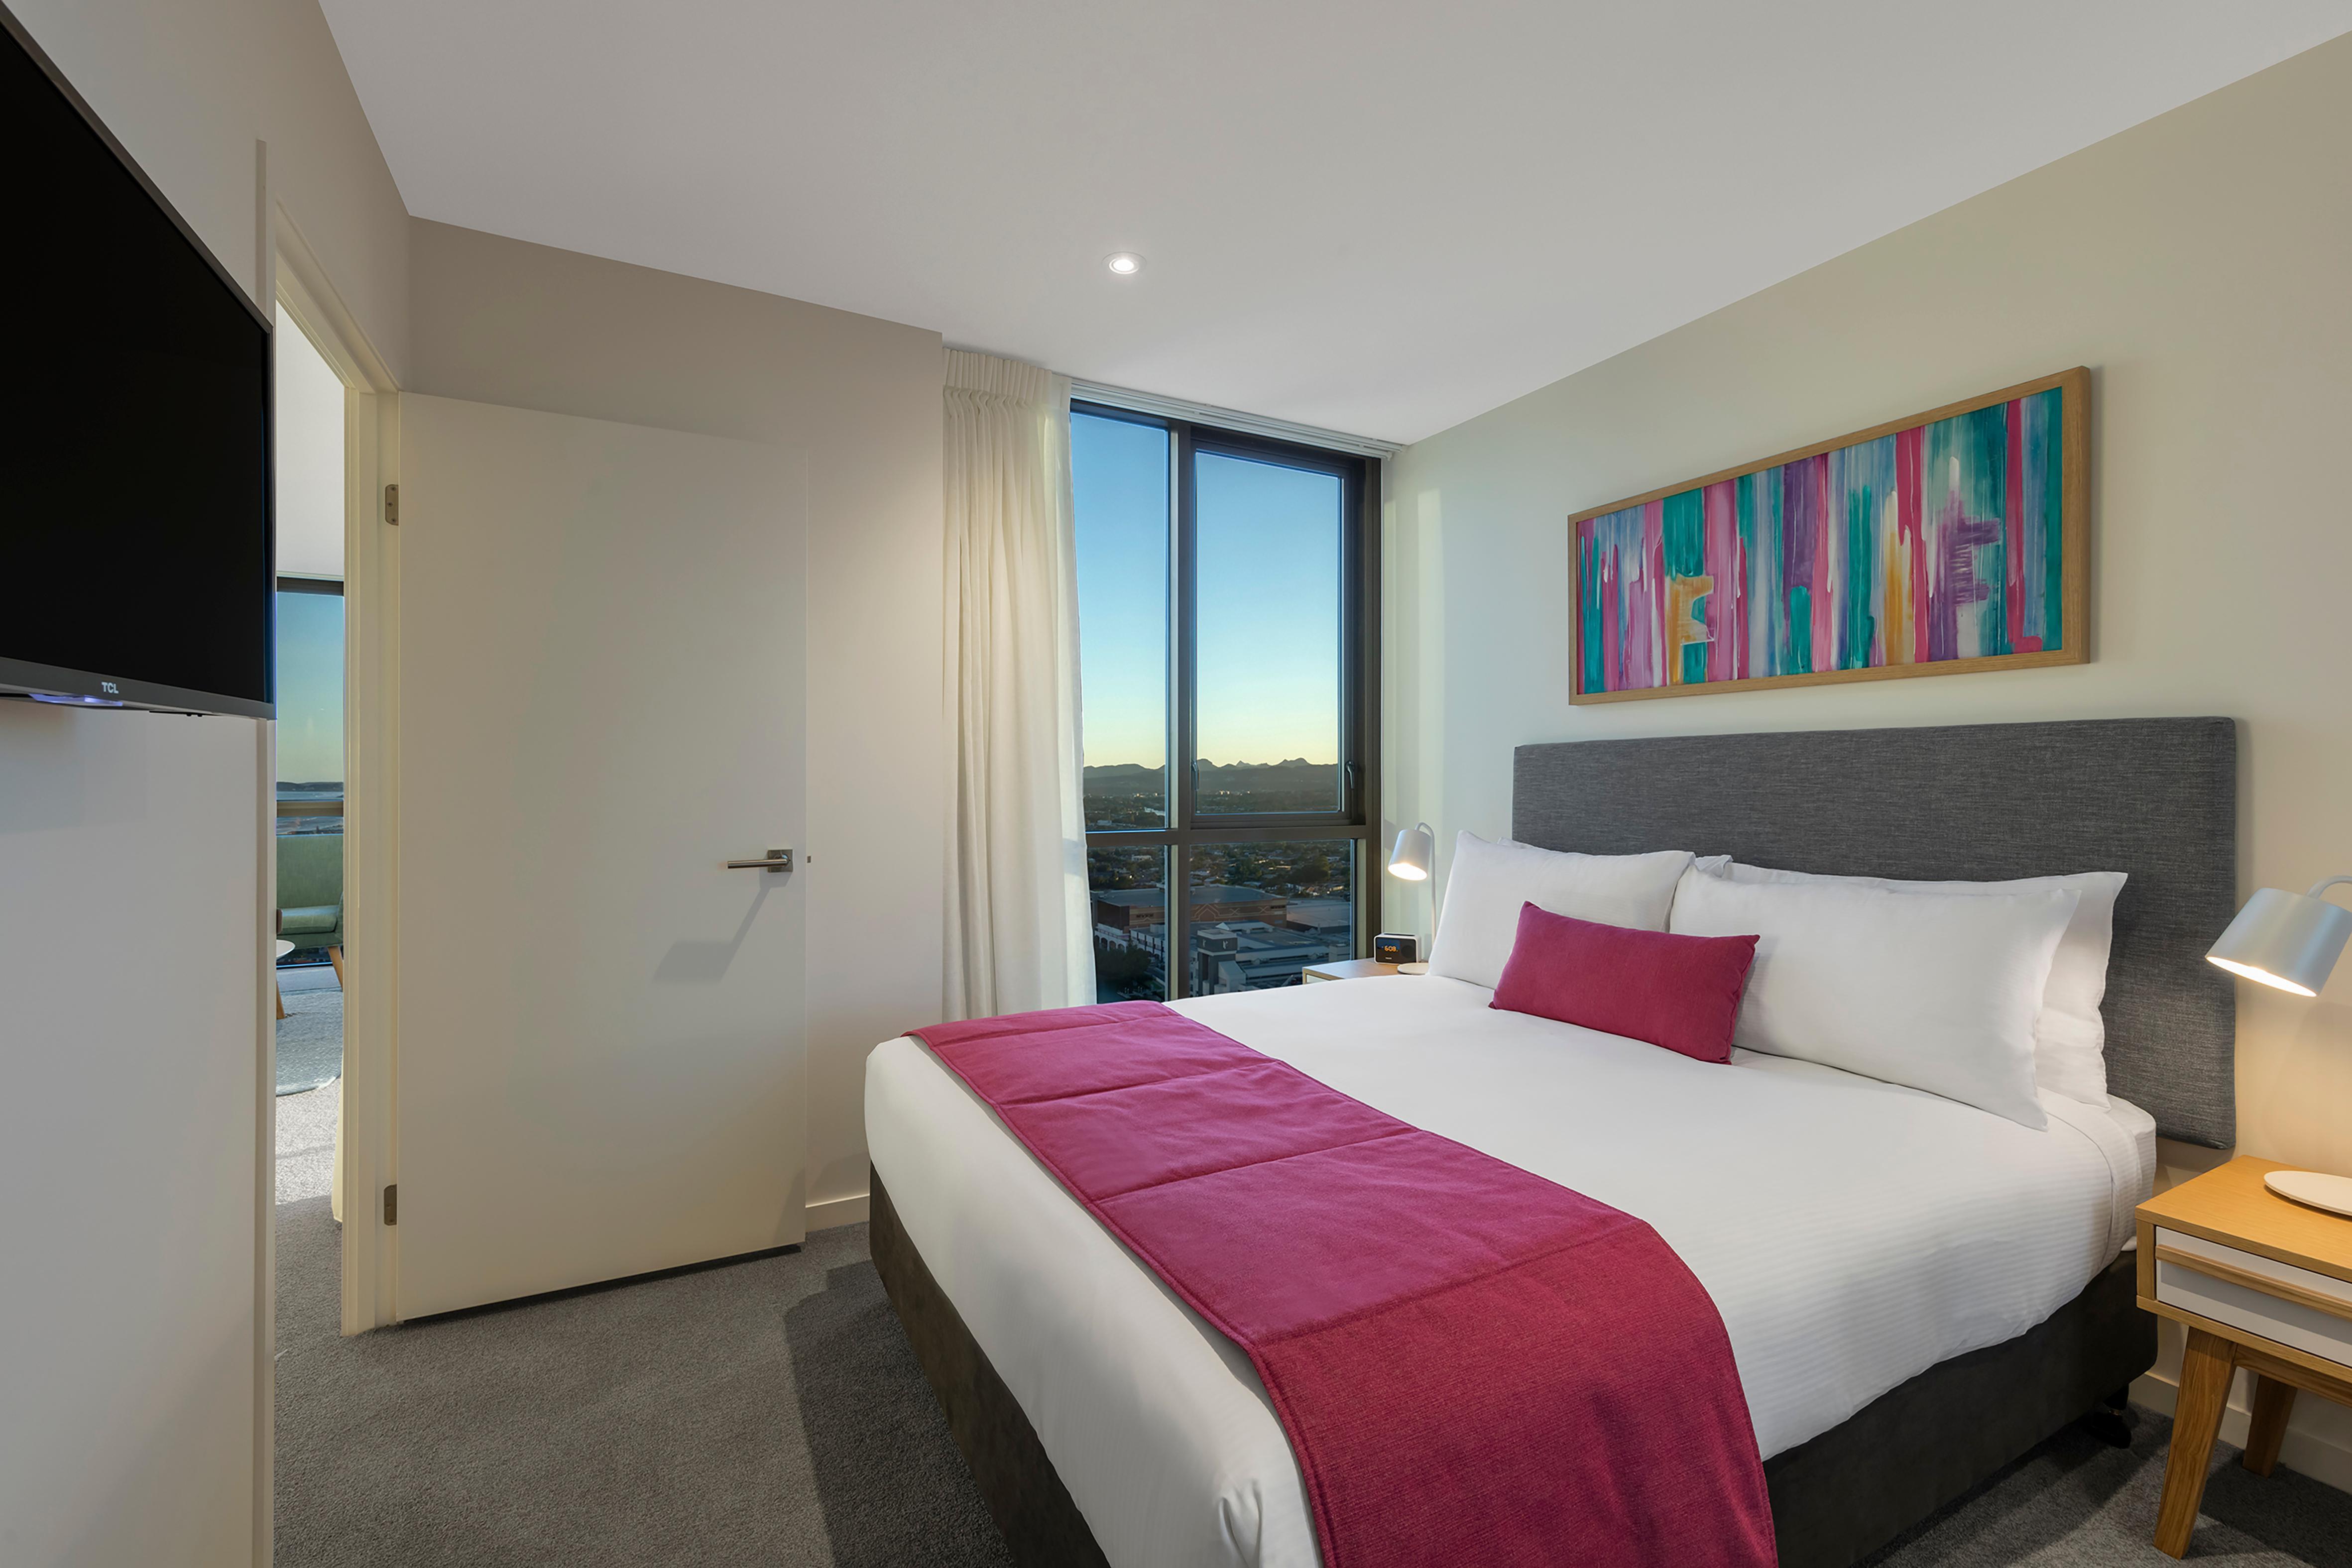 Two-Bedroom Ocean Suite image 1 at AVANI Broadbeach Gold Coast Residences - Feb 2020 by City of Gold Coast, Queensland, Australia